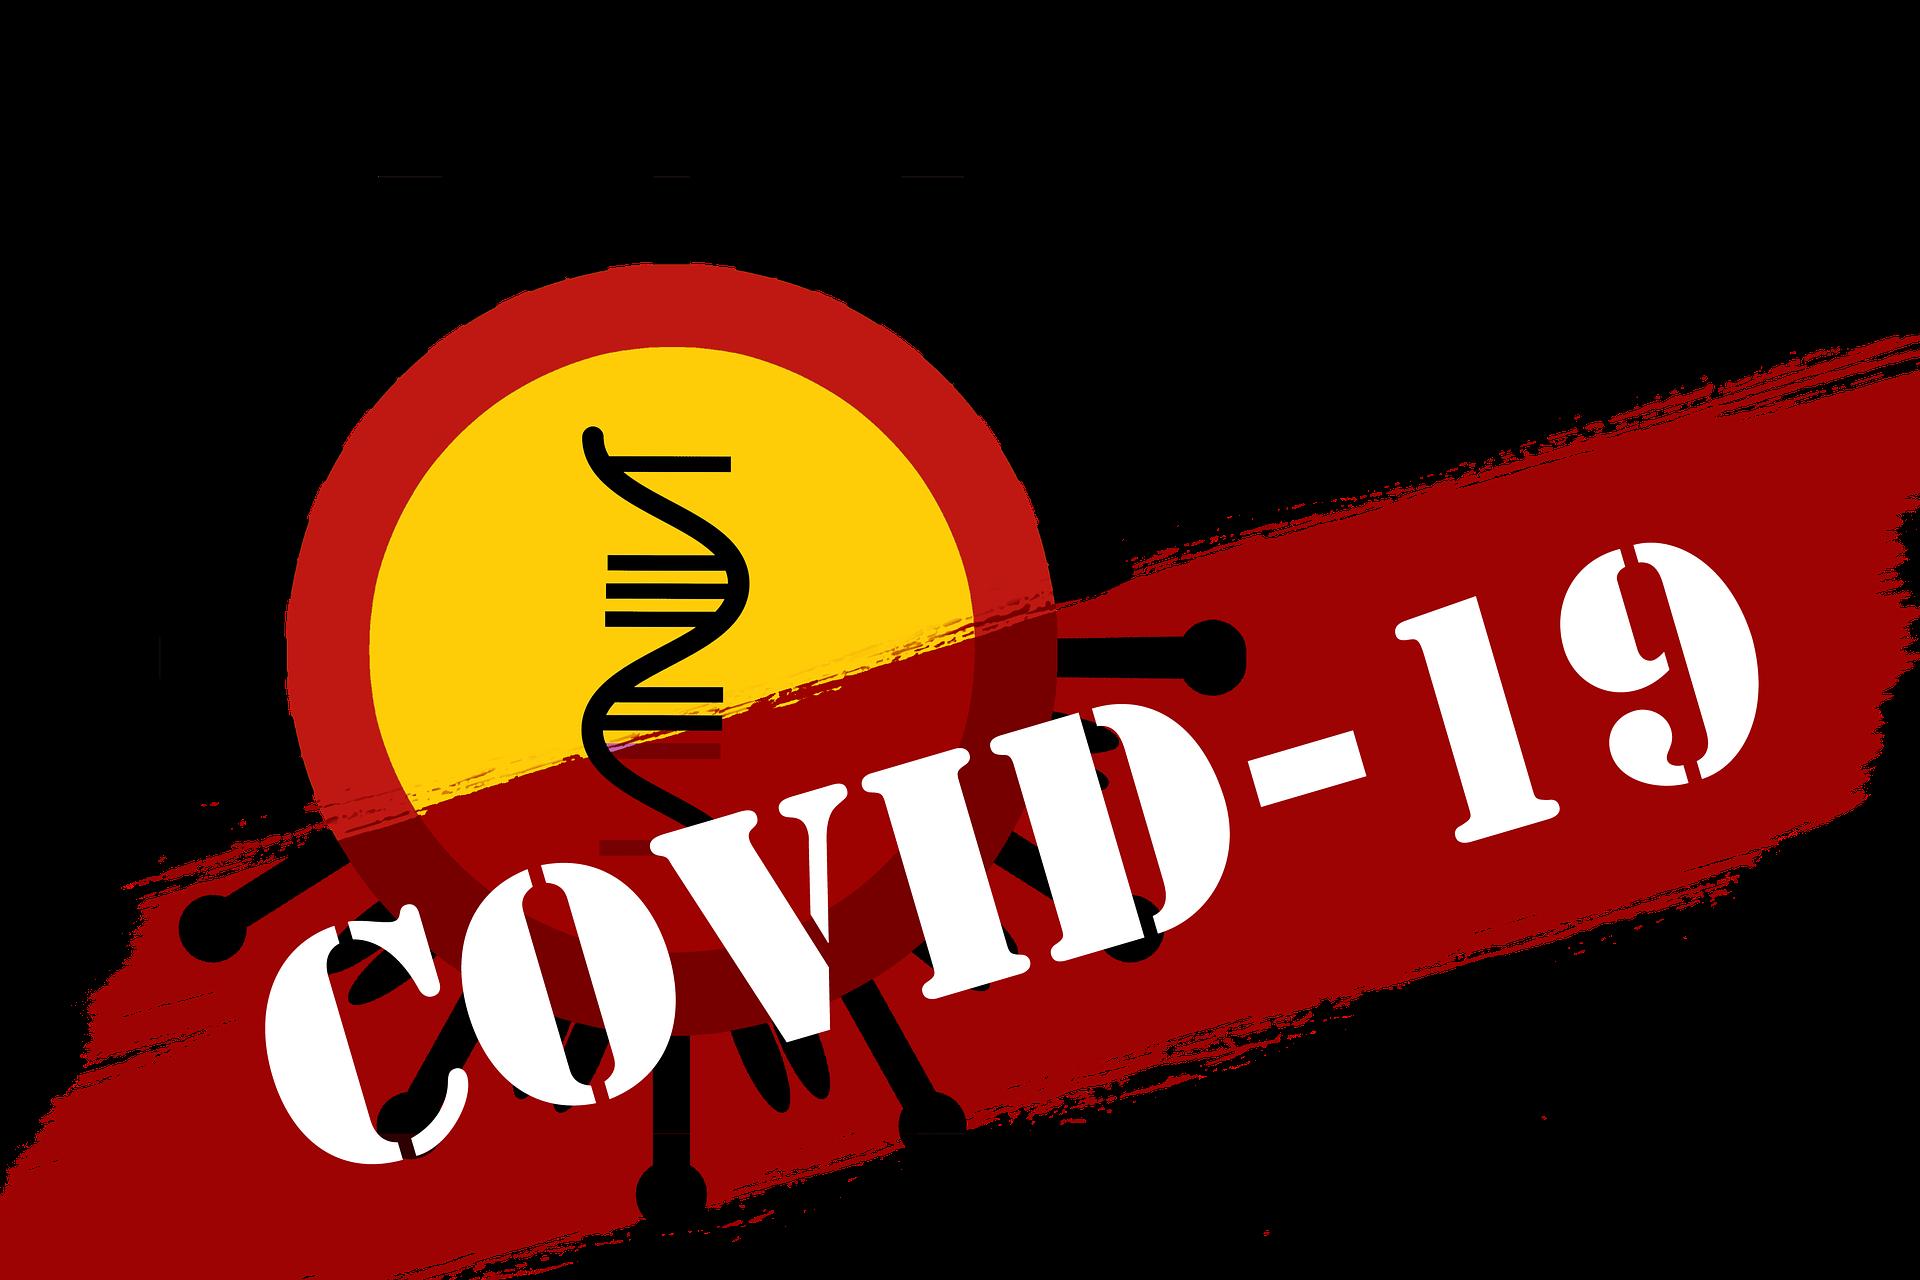 Coronavirus impacts Nreal wearable